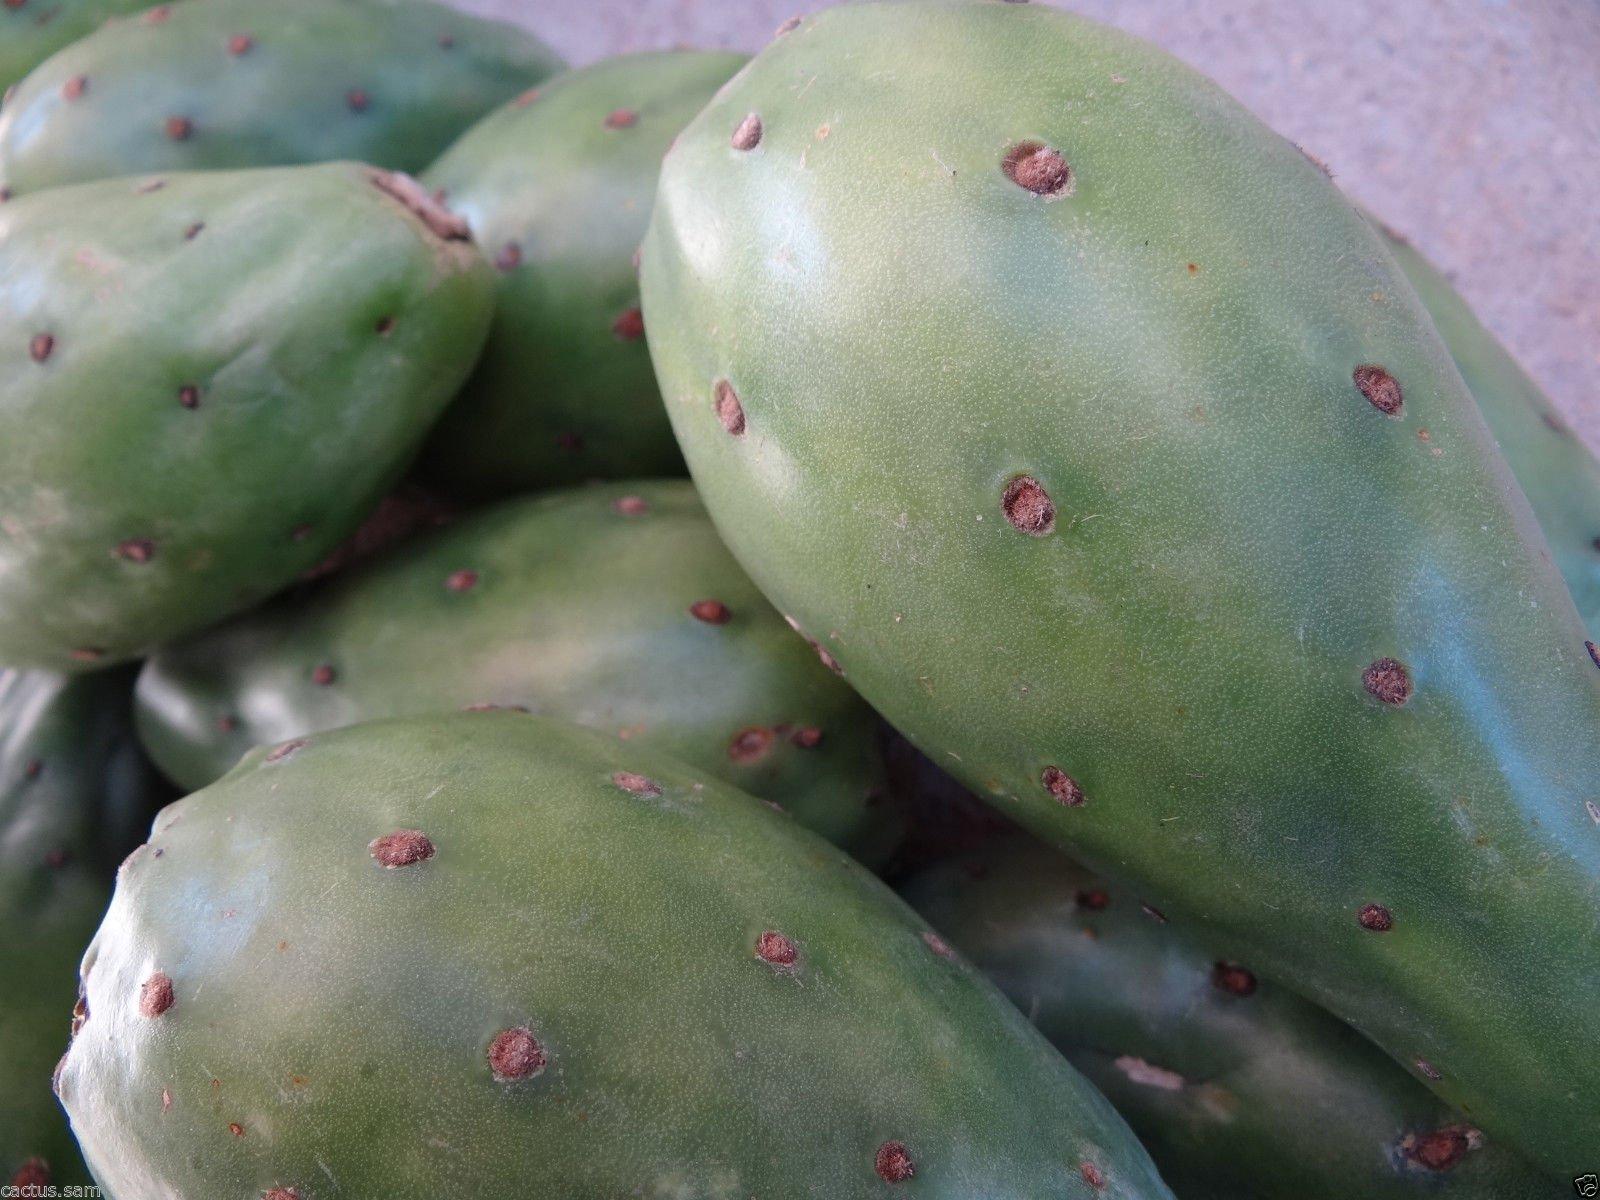 1 Cactus Pad, Green Prickly Pear, Opuntia ficus indica, Fruit Nopal Tuna Verde